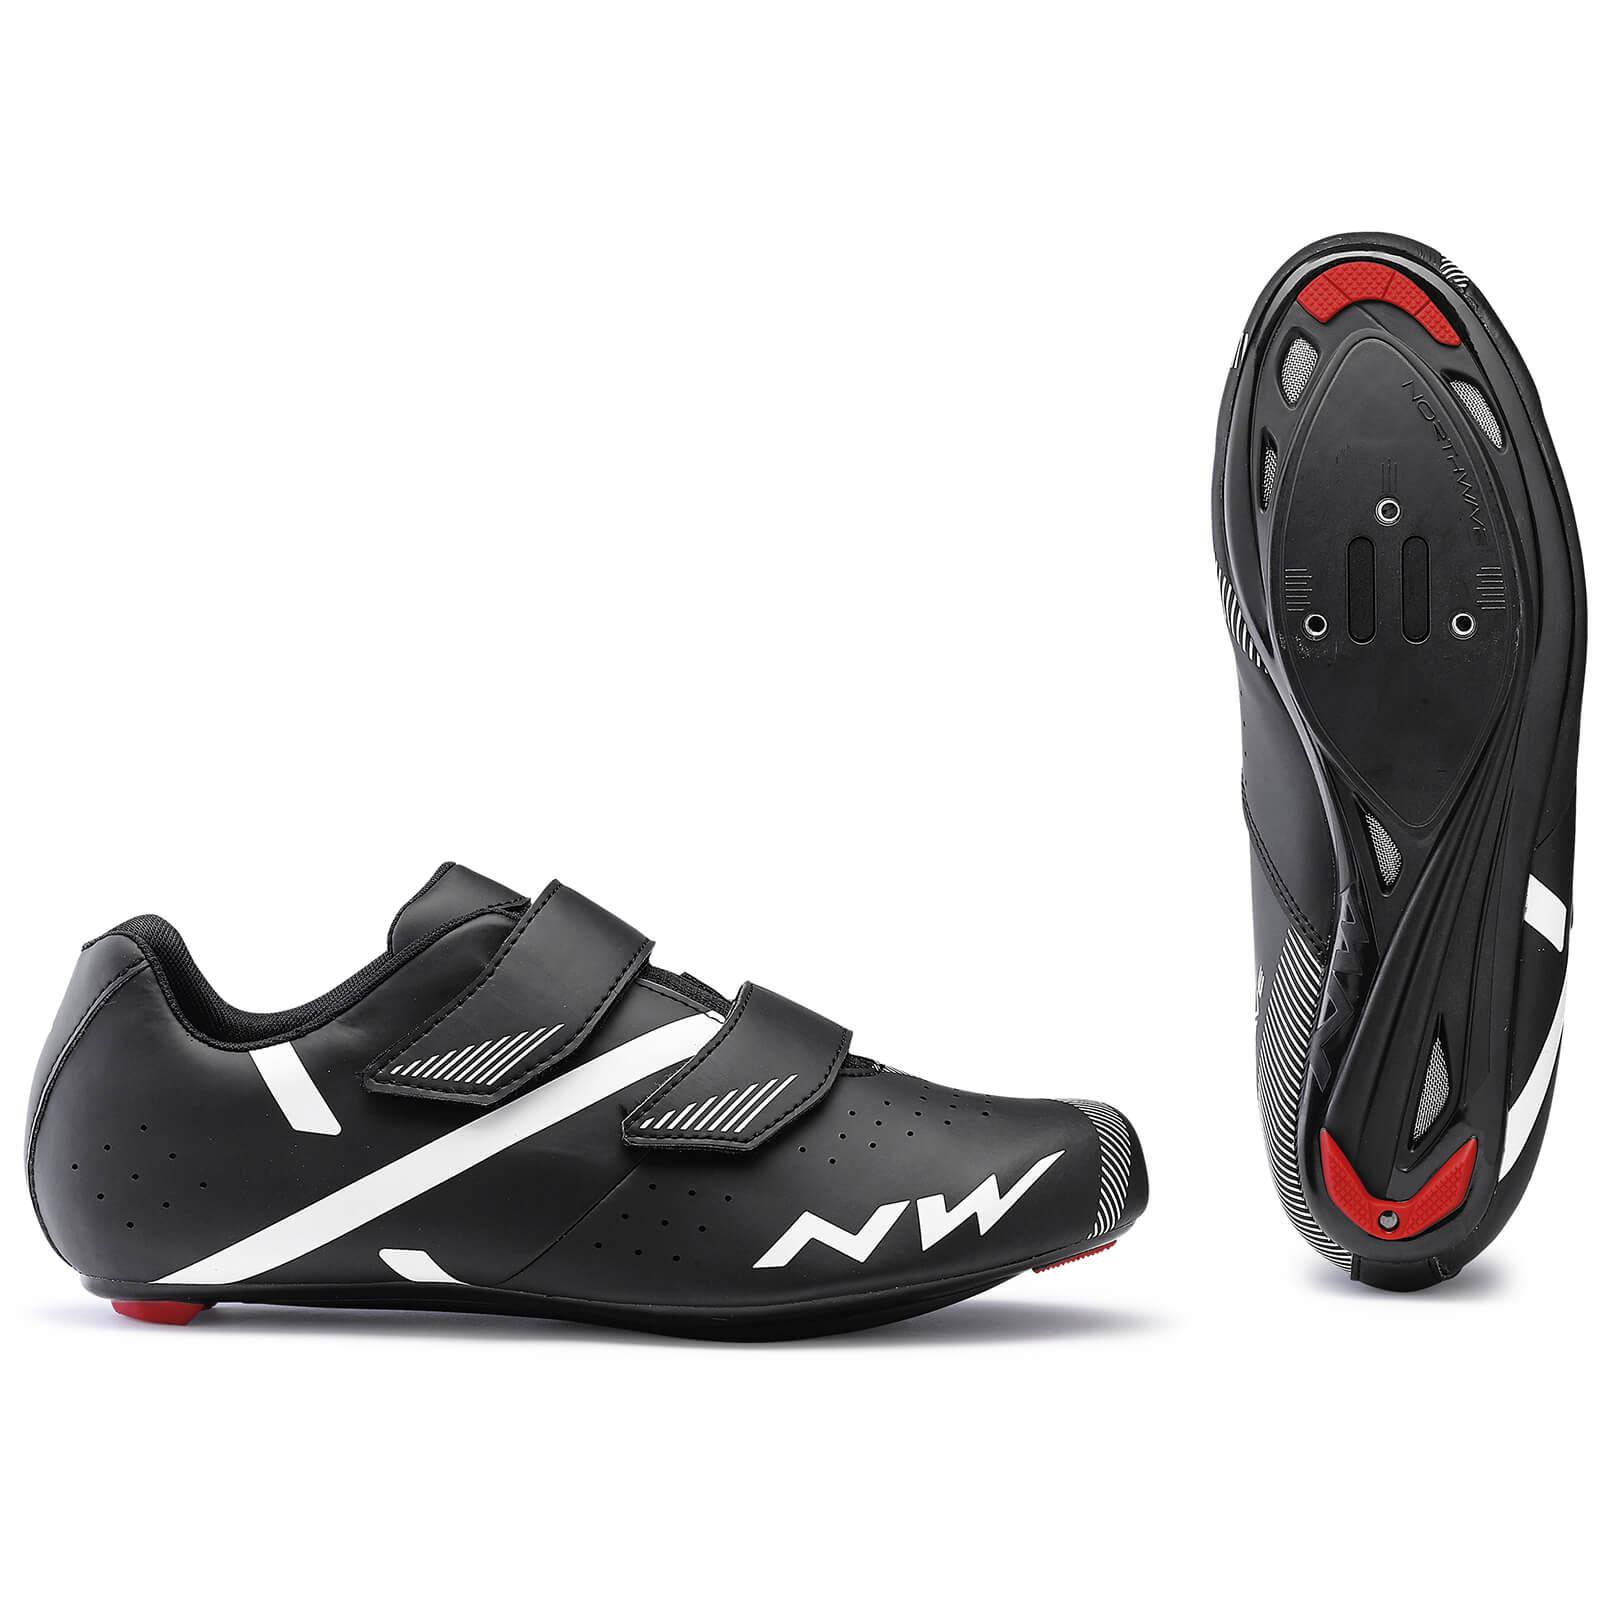 Northwave Jet 2 Road Shoes - EU 41